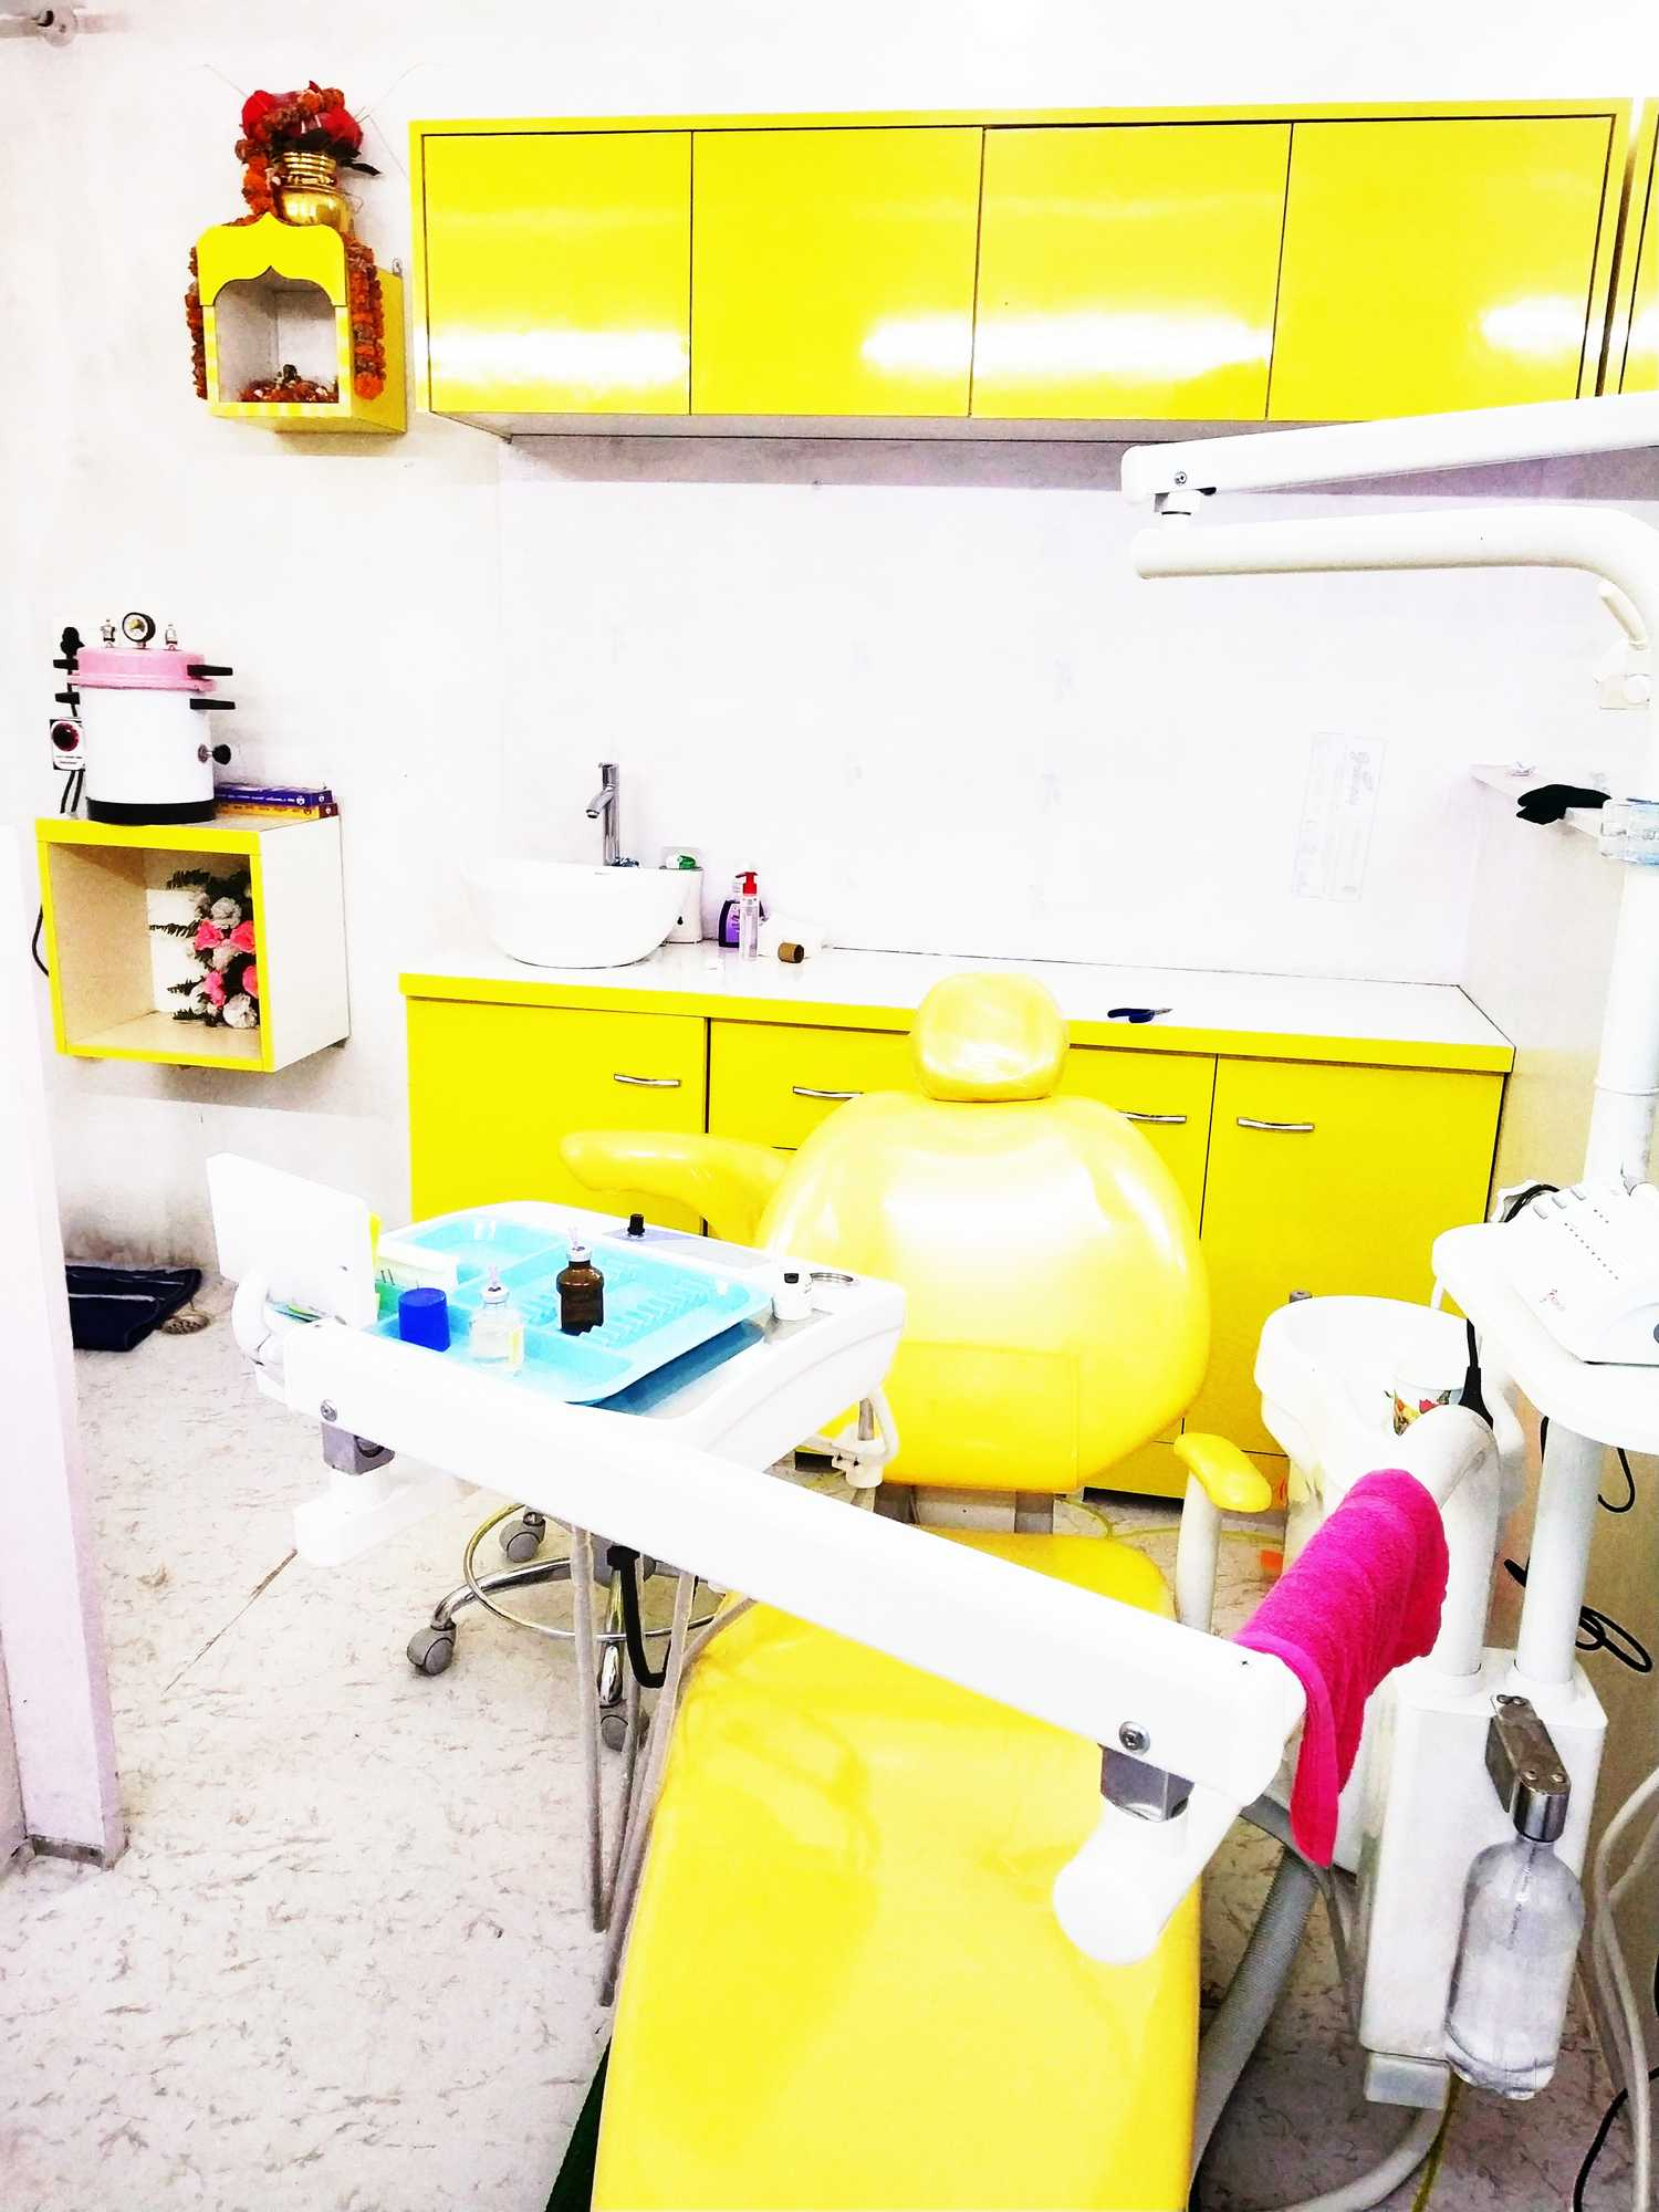 Top 100 Dentists in Muzaffarpur - Best Dental Clinics - Book